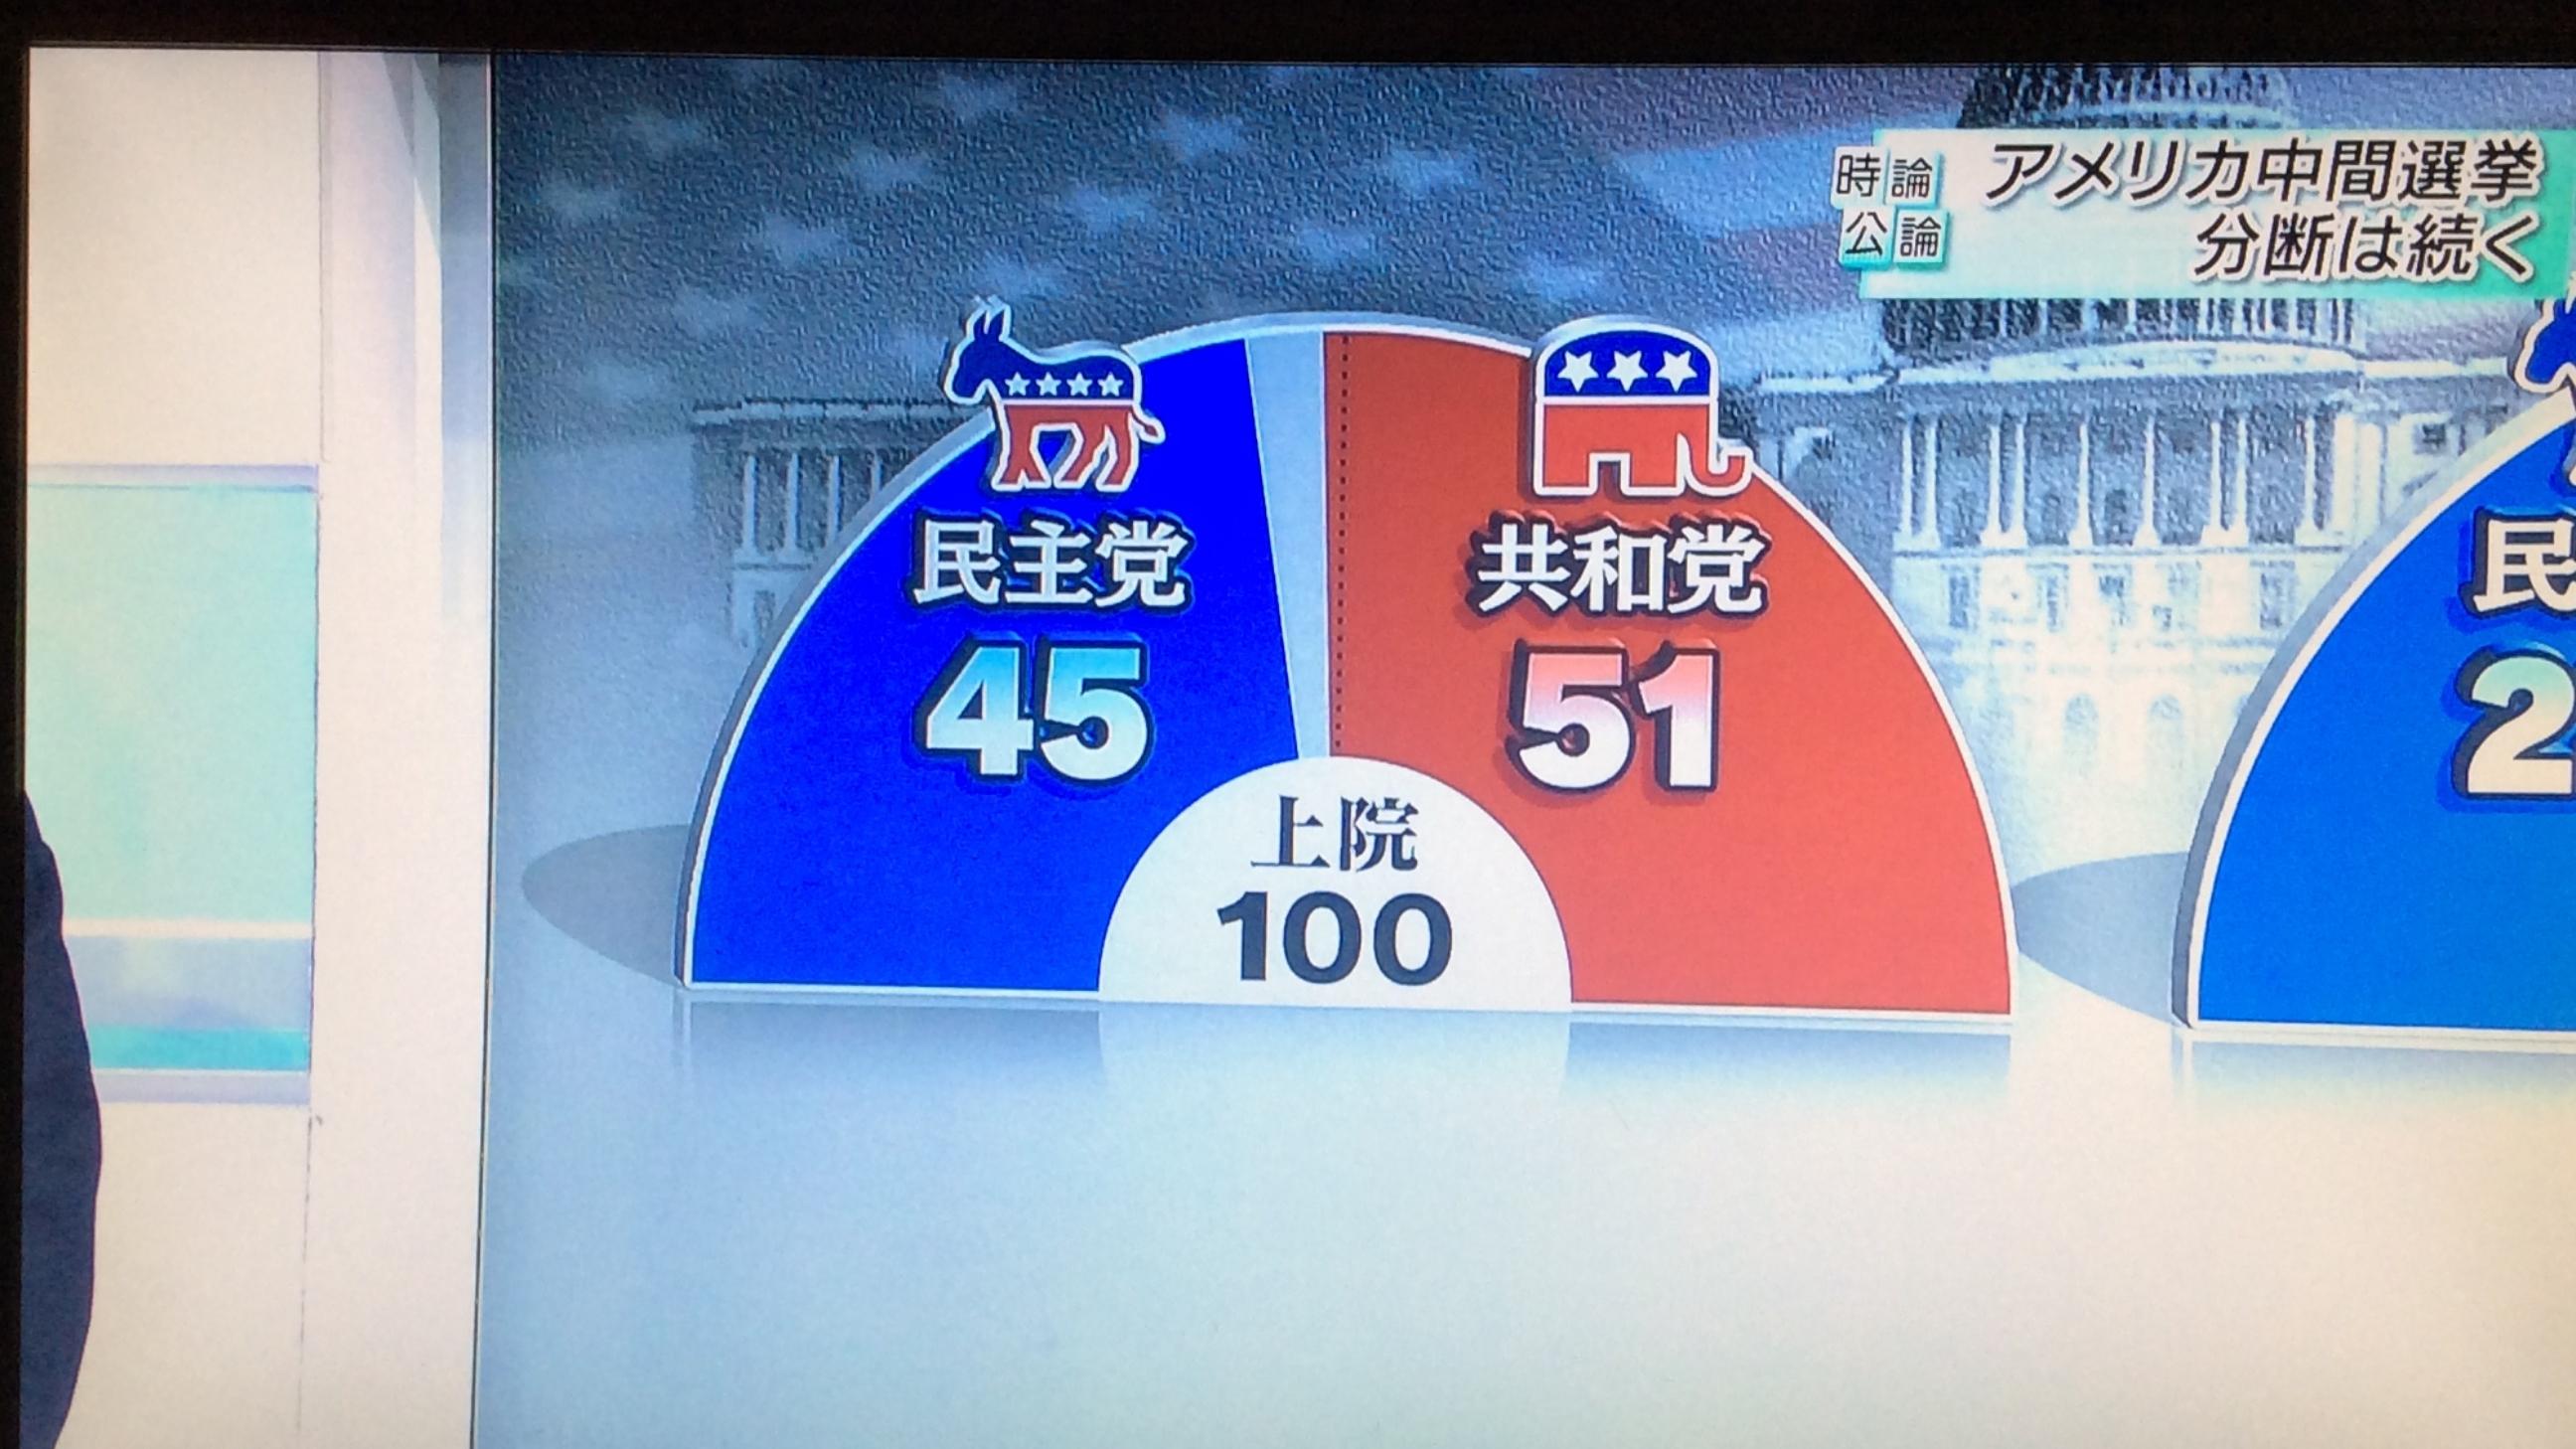 JUNSKY blog アメリカ中間選挙で民主党が上院でも共和党の倍以上当選!